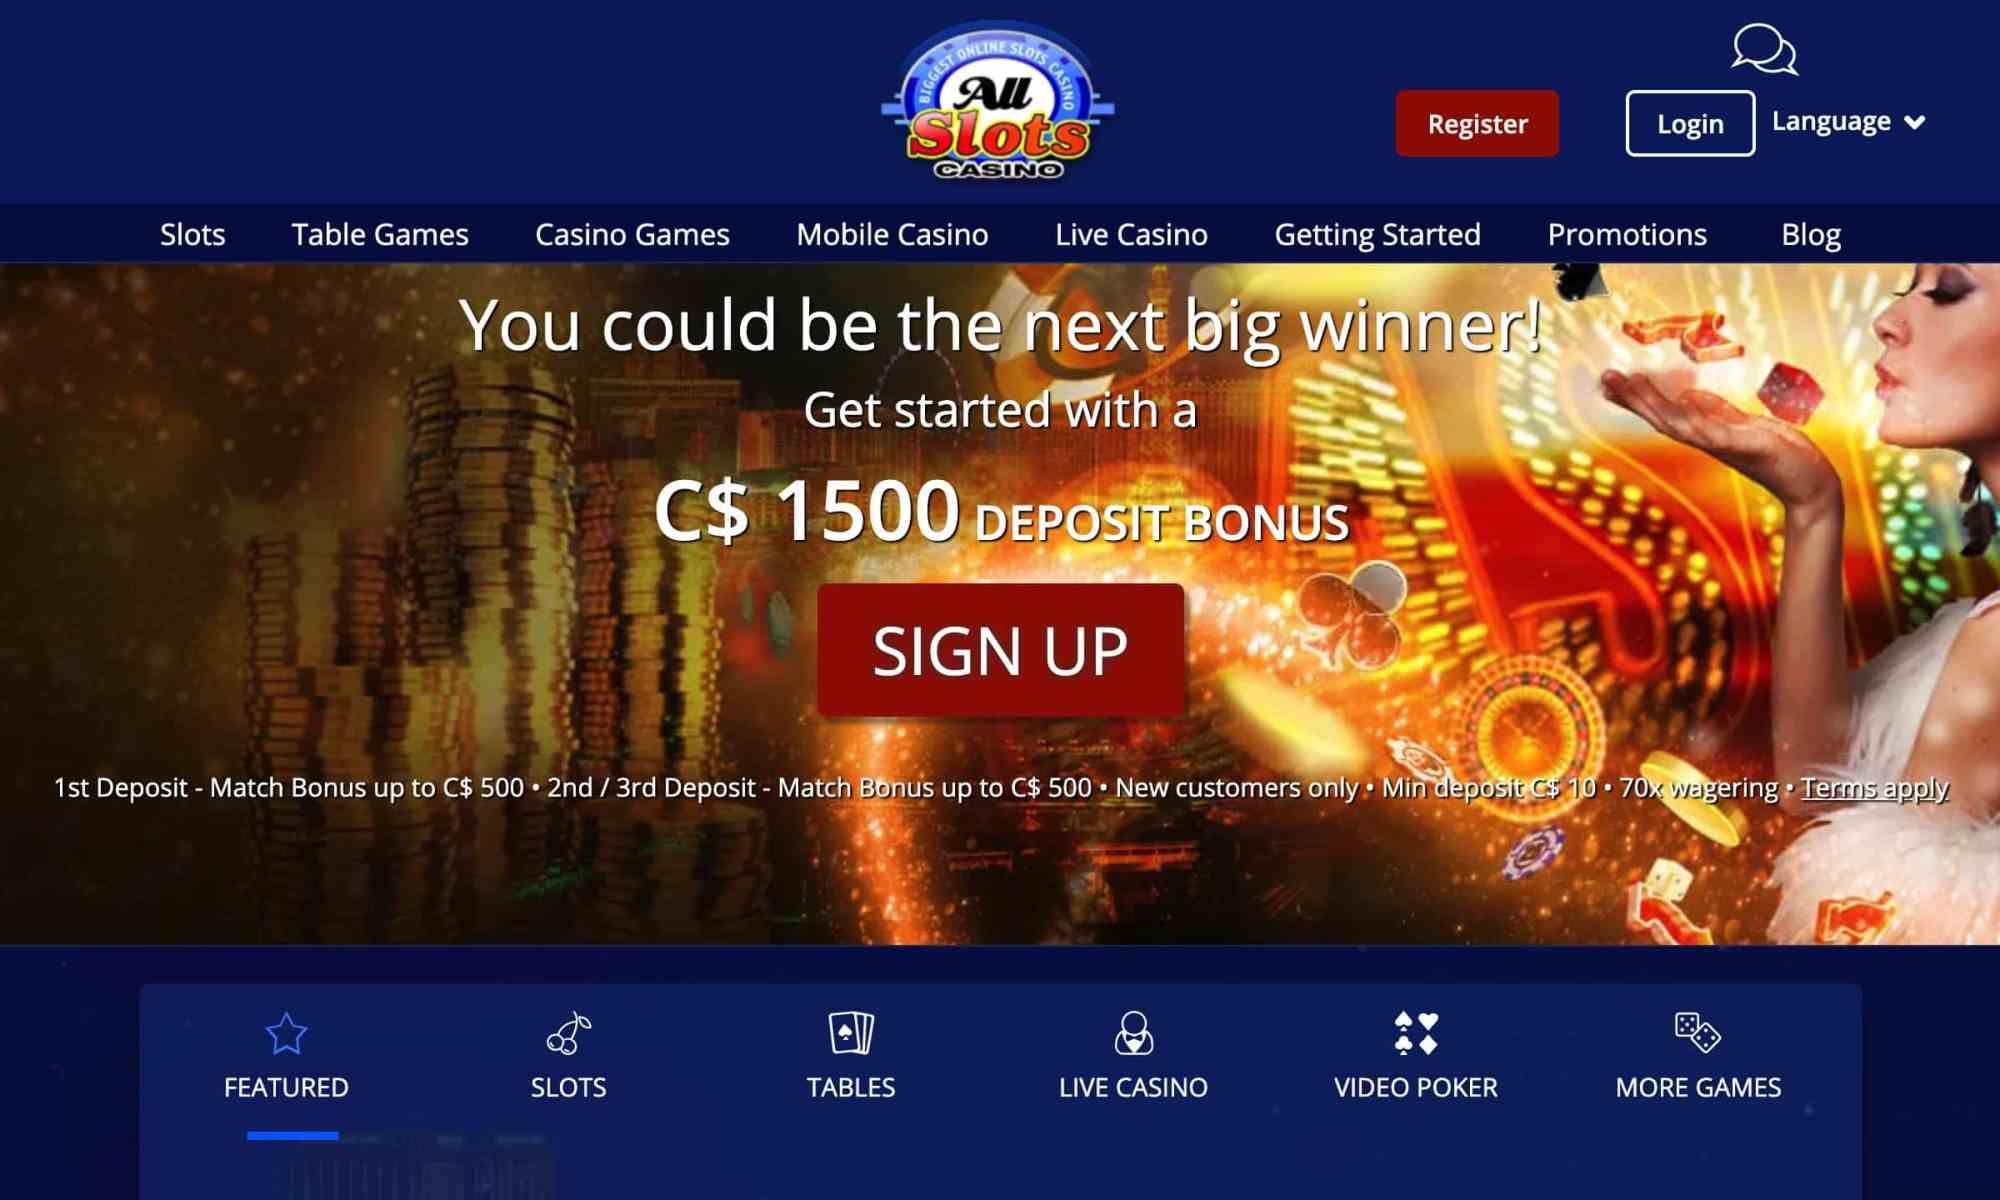 All Slots Casino - Claim A 300% Deposit Bonus Now!